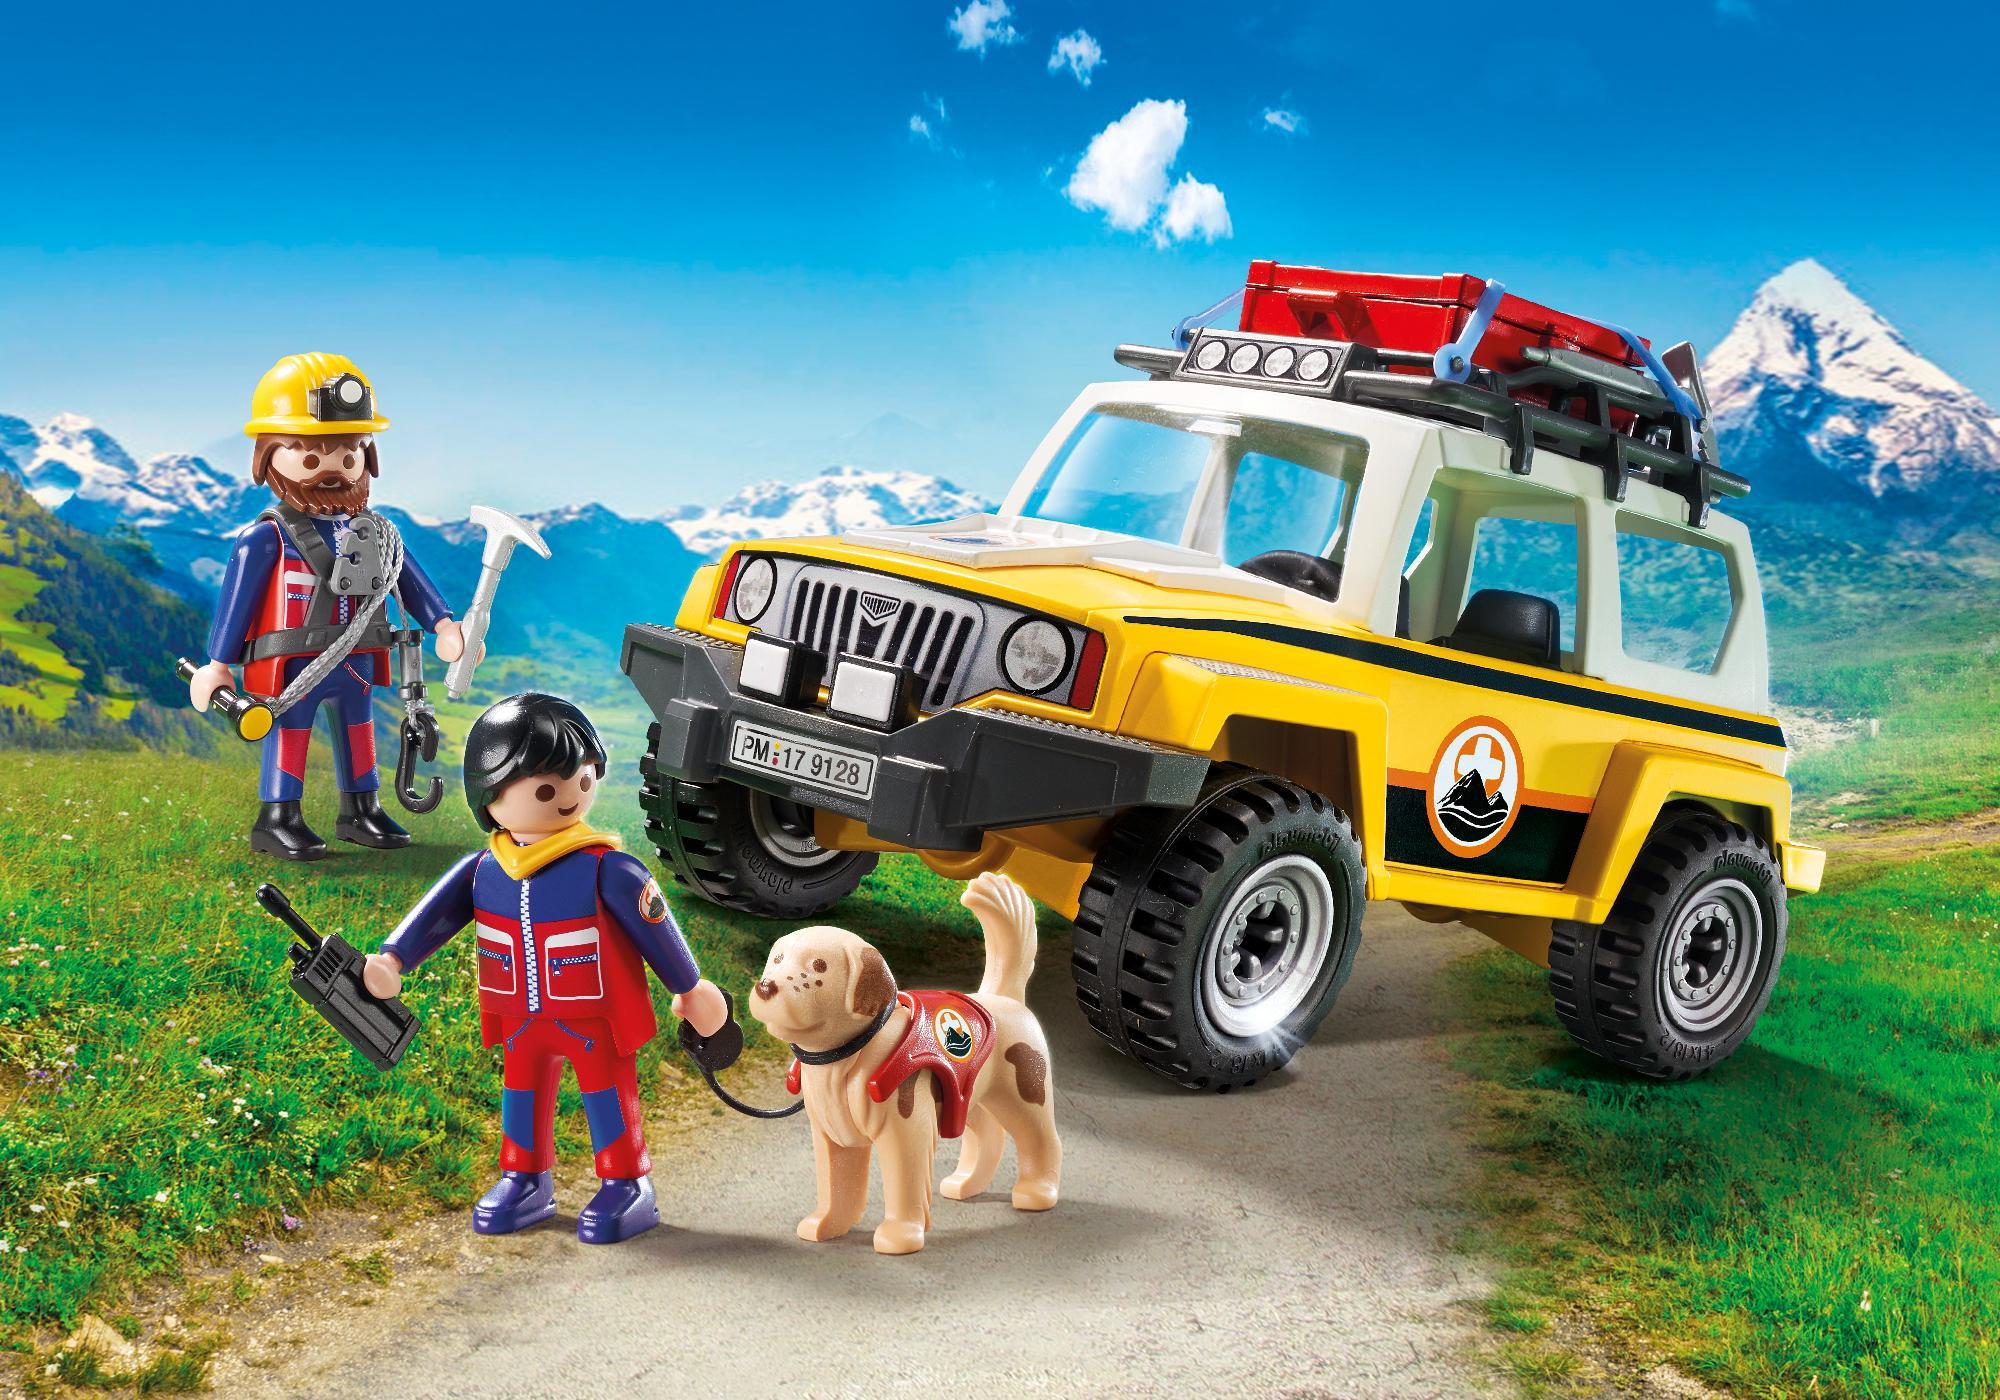 http://media.playmobil.com/i/playmobil/9128_product_detail/Secouristes des montagnes avec véhicule